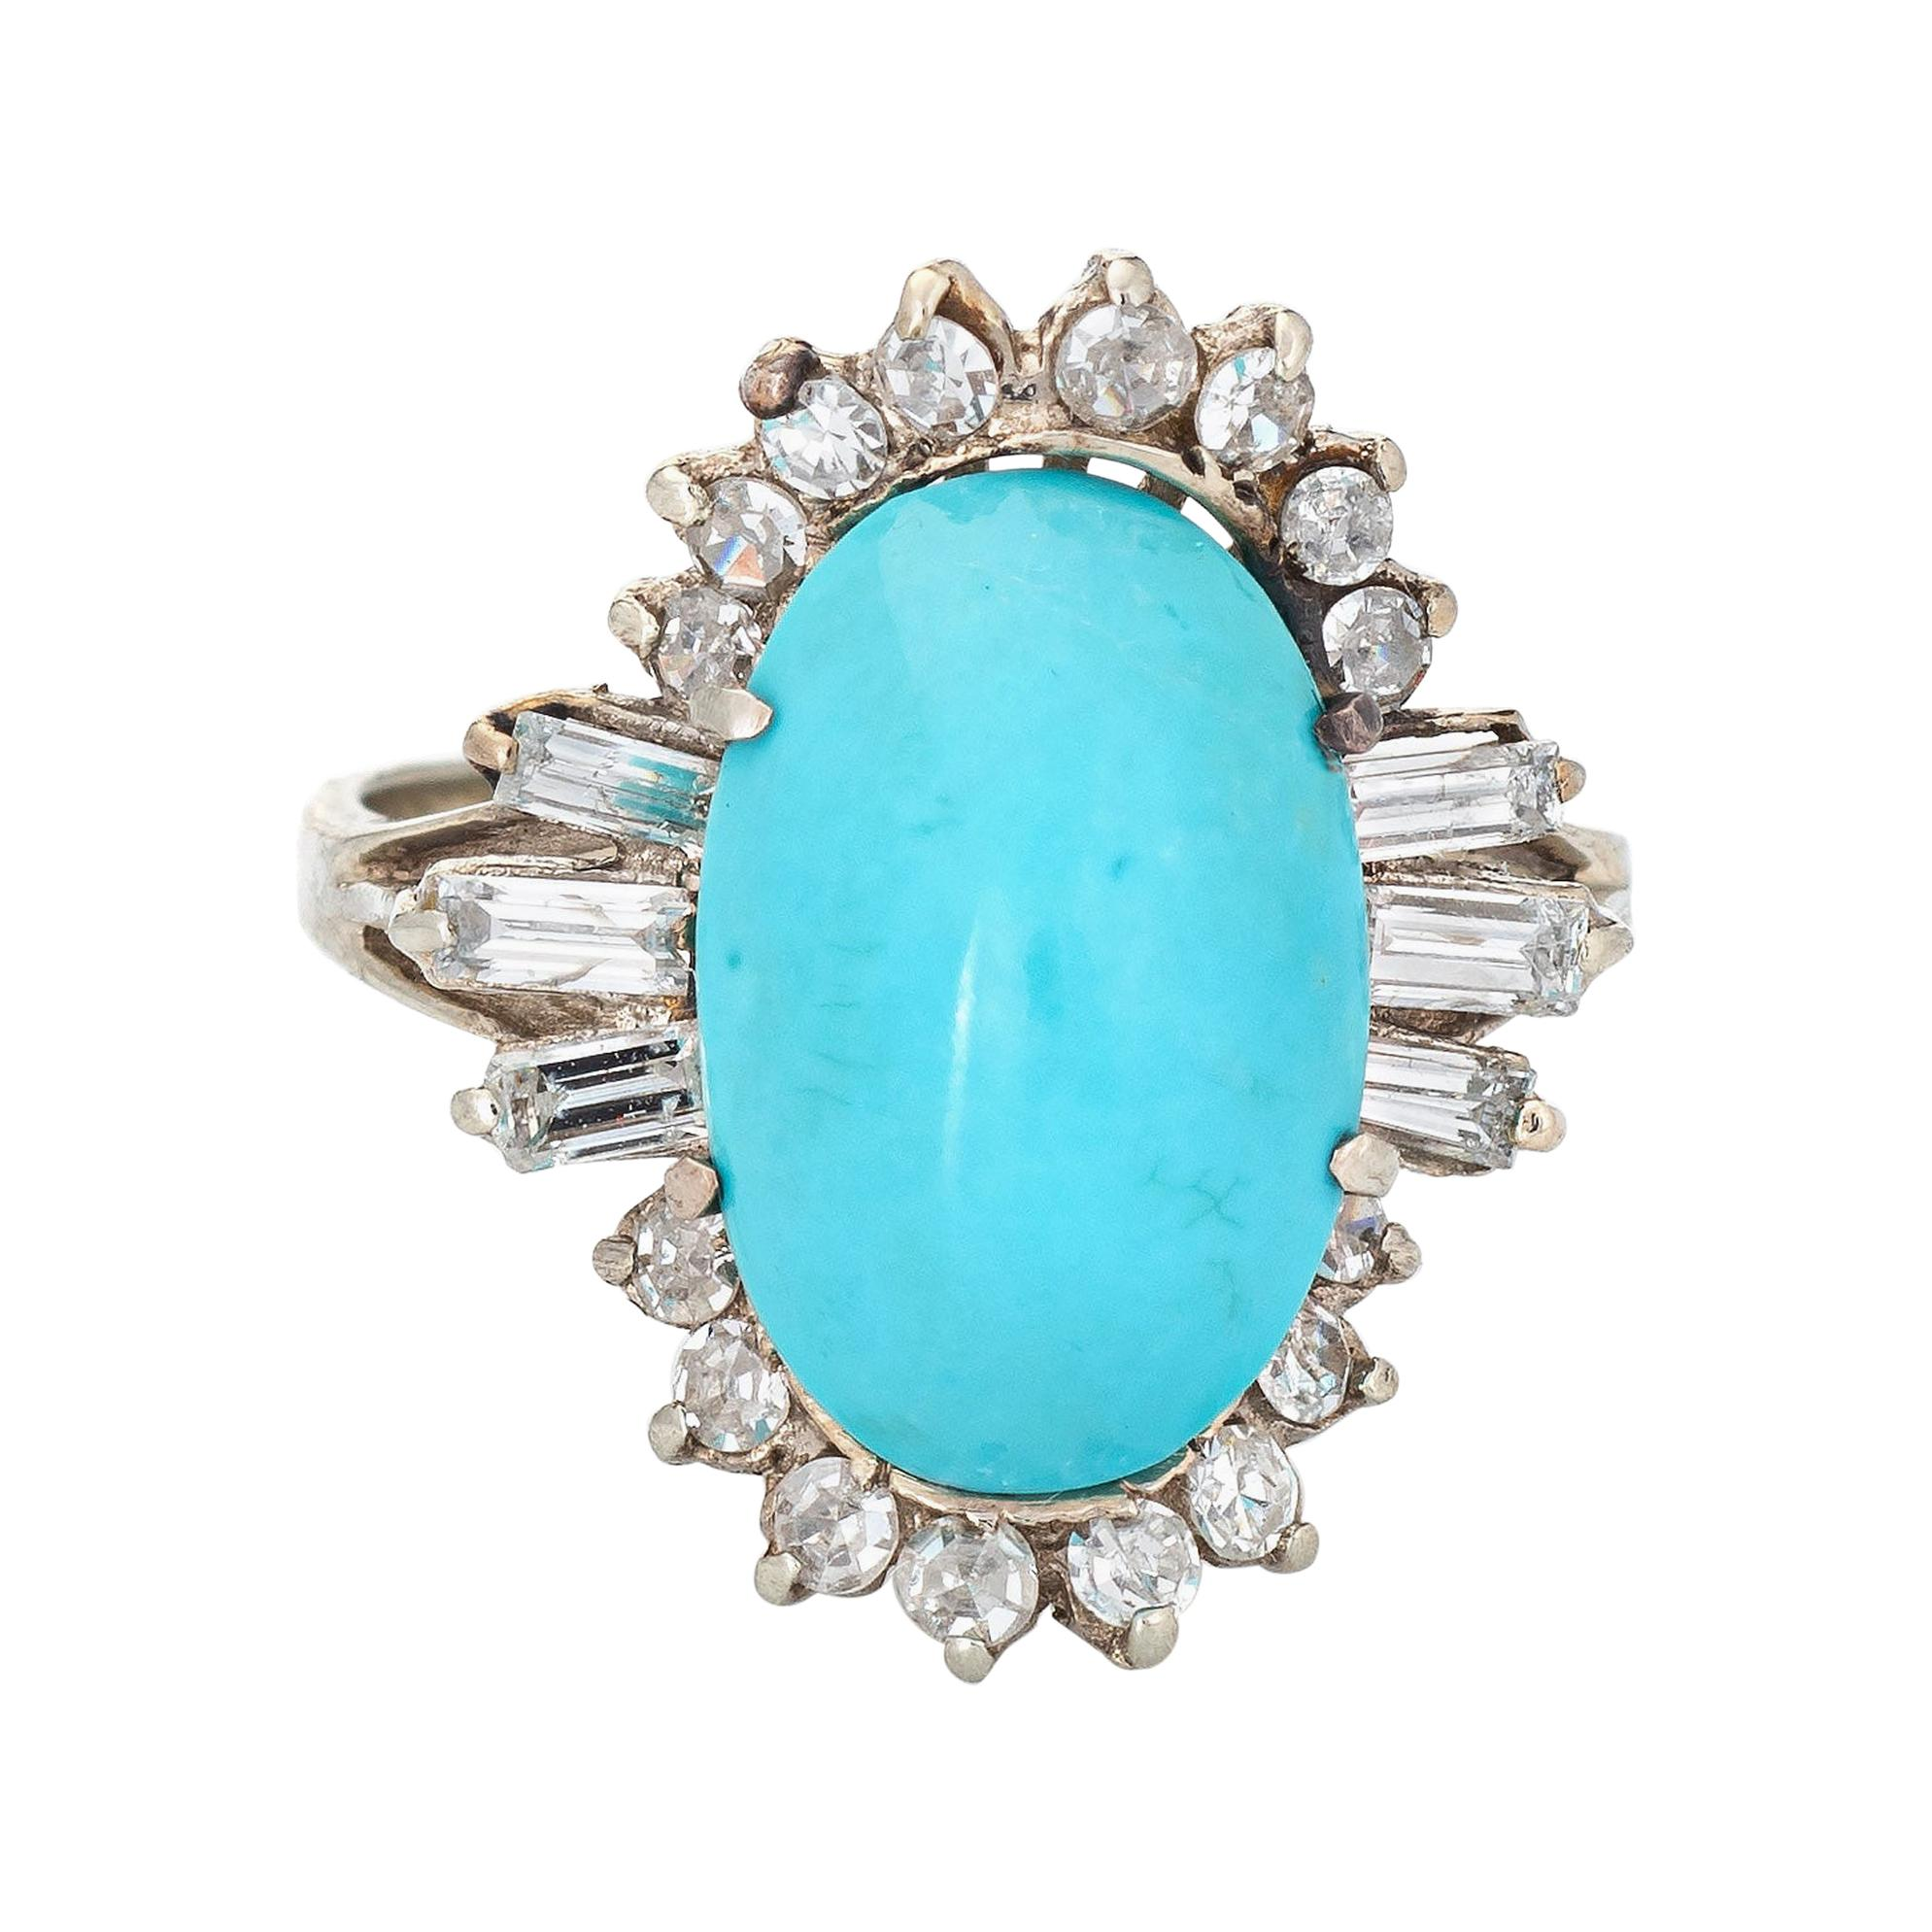 Turquoise Diamond Ring Vintage 14k White Gold Cocktail Jewelry Mid Century 5.75